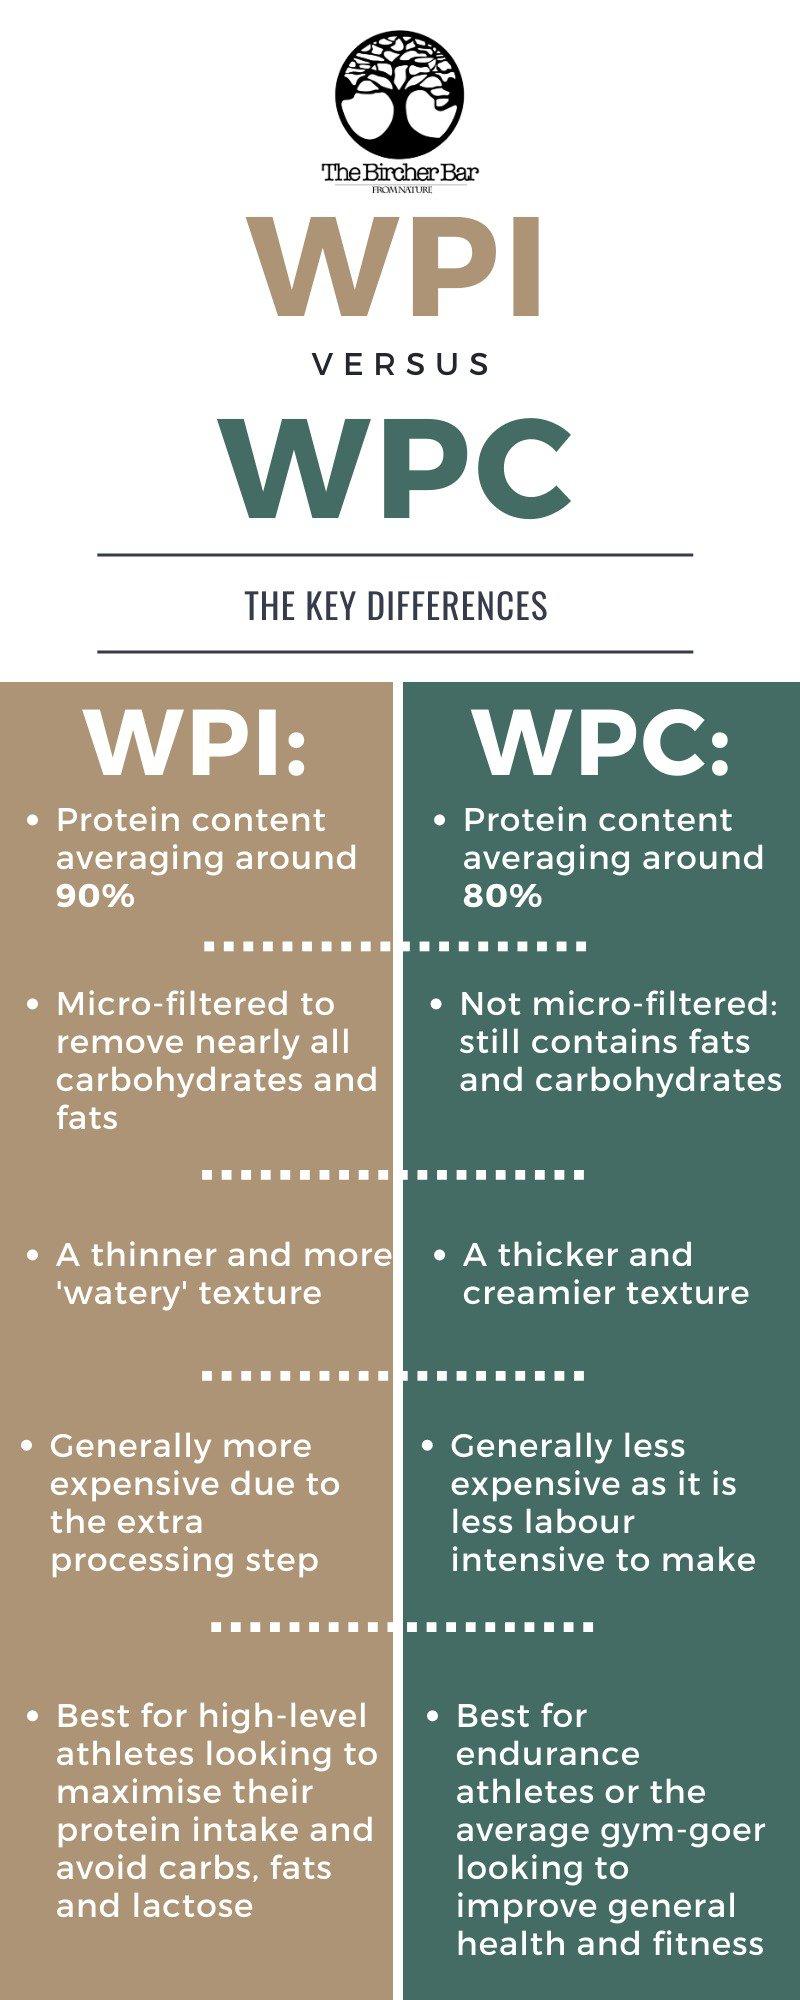 wpi vs wpc